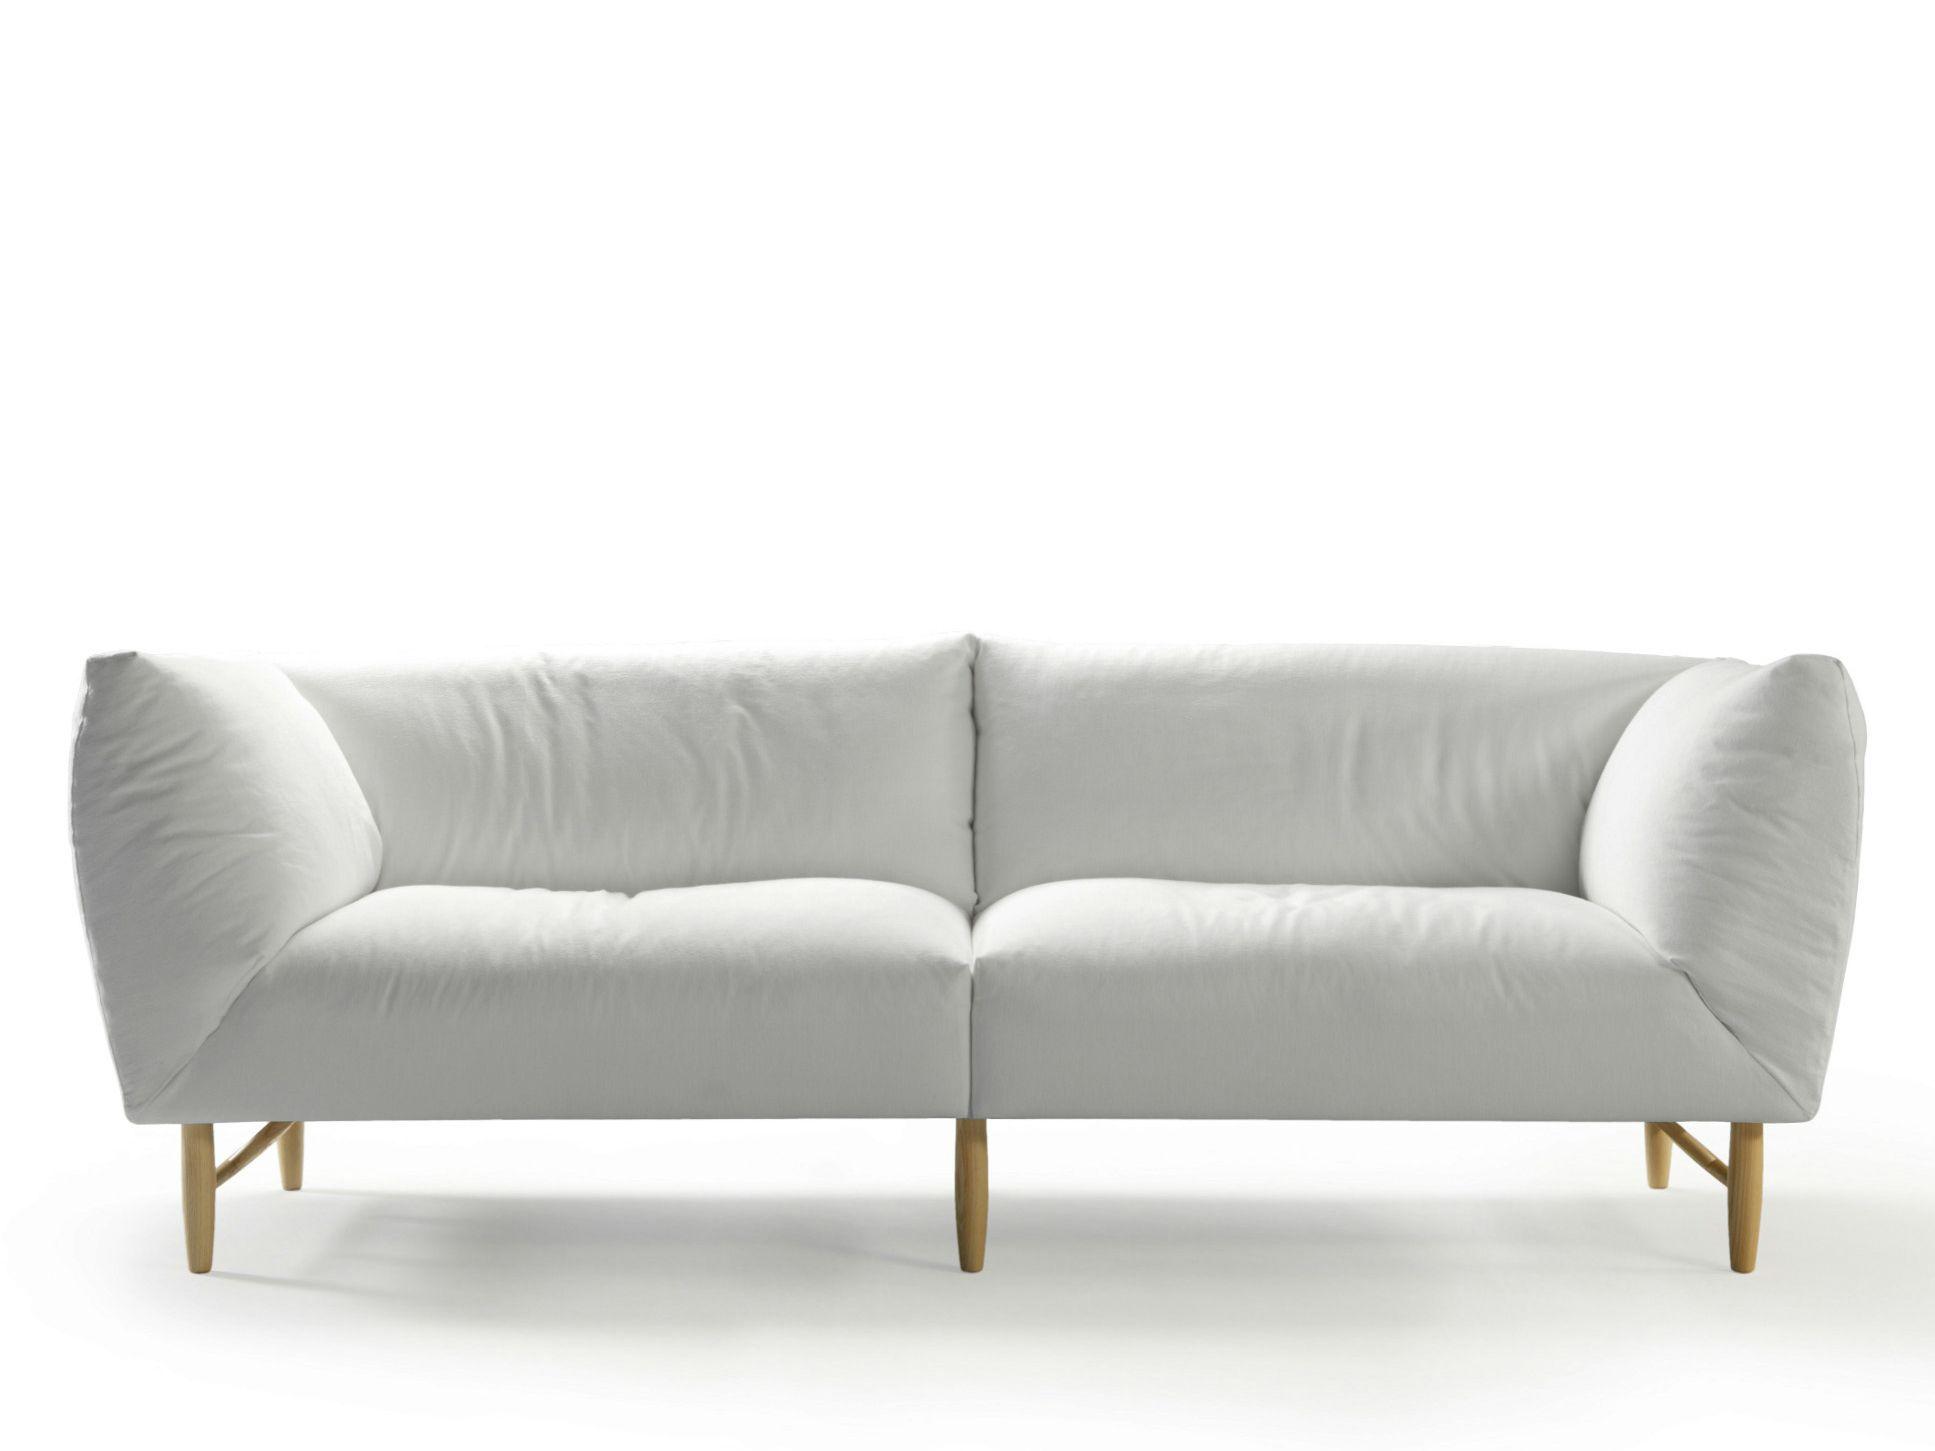 Upholstered sofa COPLA | Sofa - SANCAL DISEÑO | furniture ...